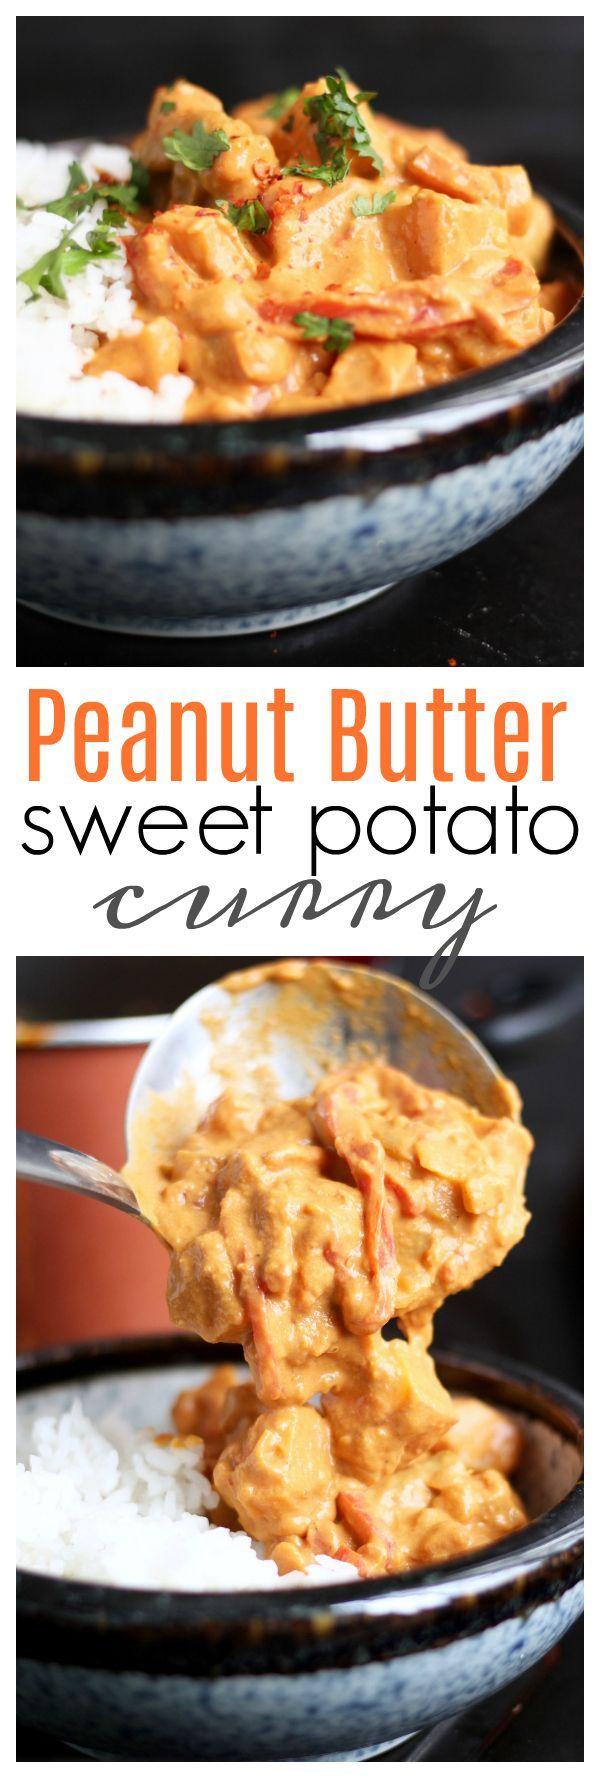 Creamy Peanut Butter Sweet Potato Curry